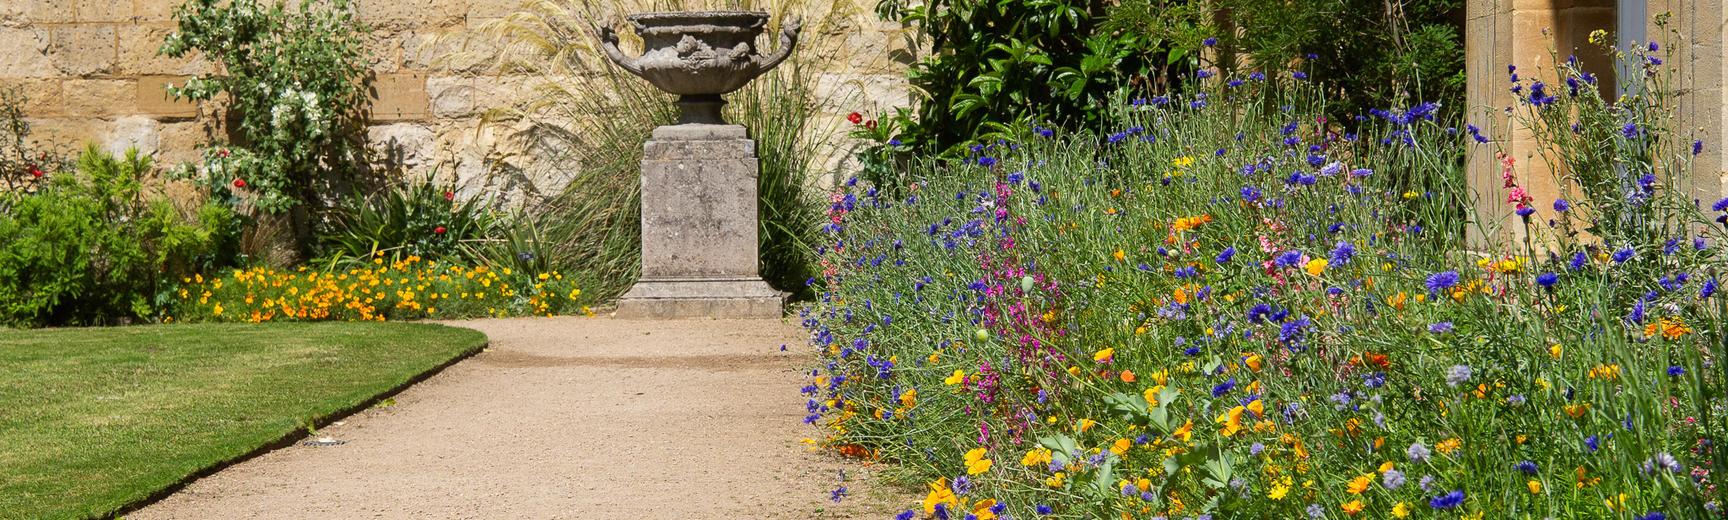 event lawn beds oxford botanic garden